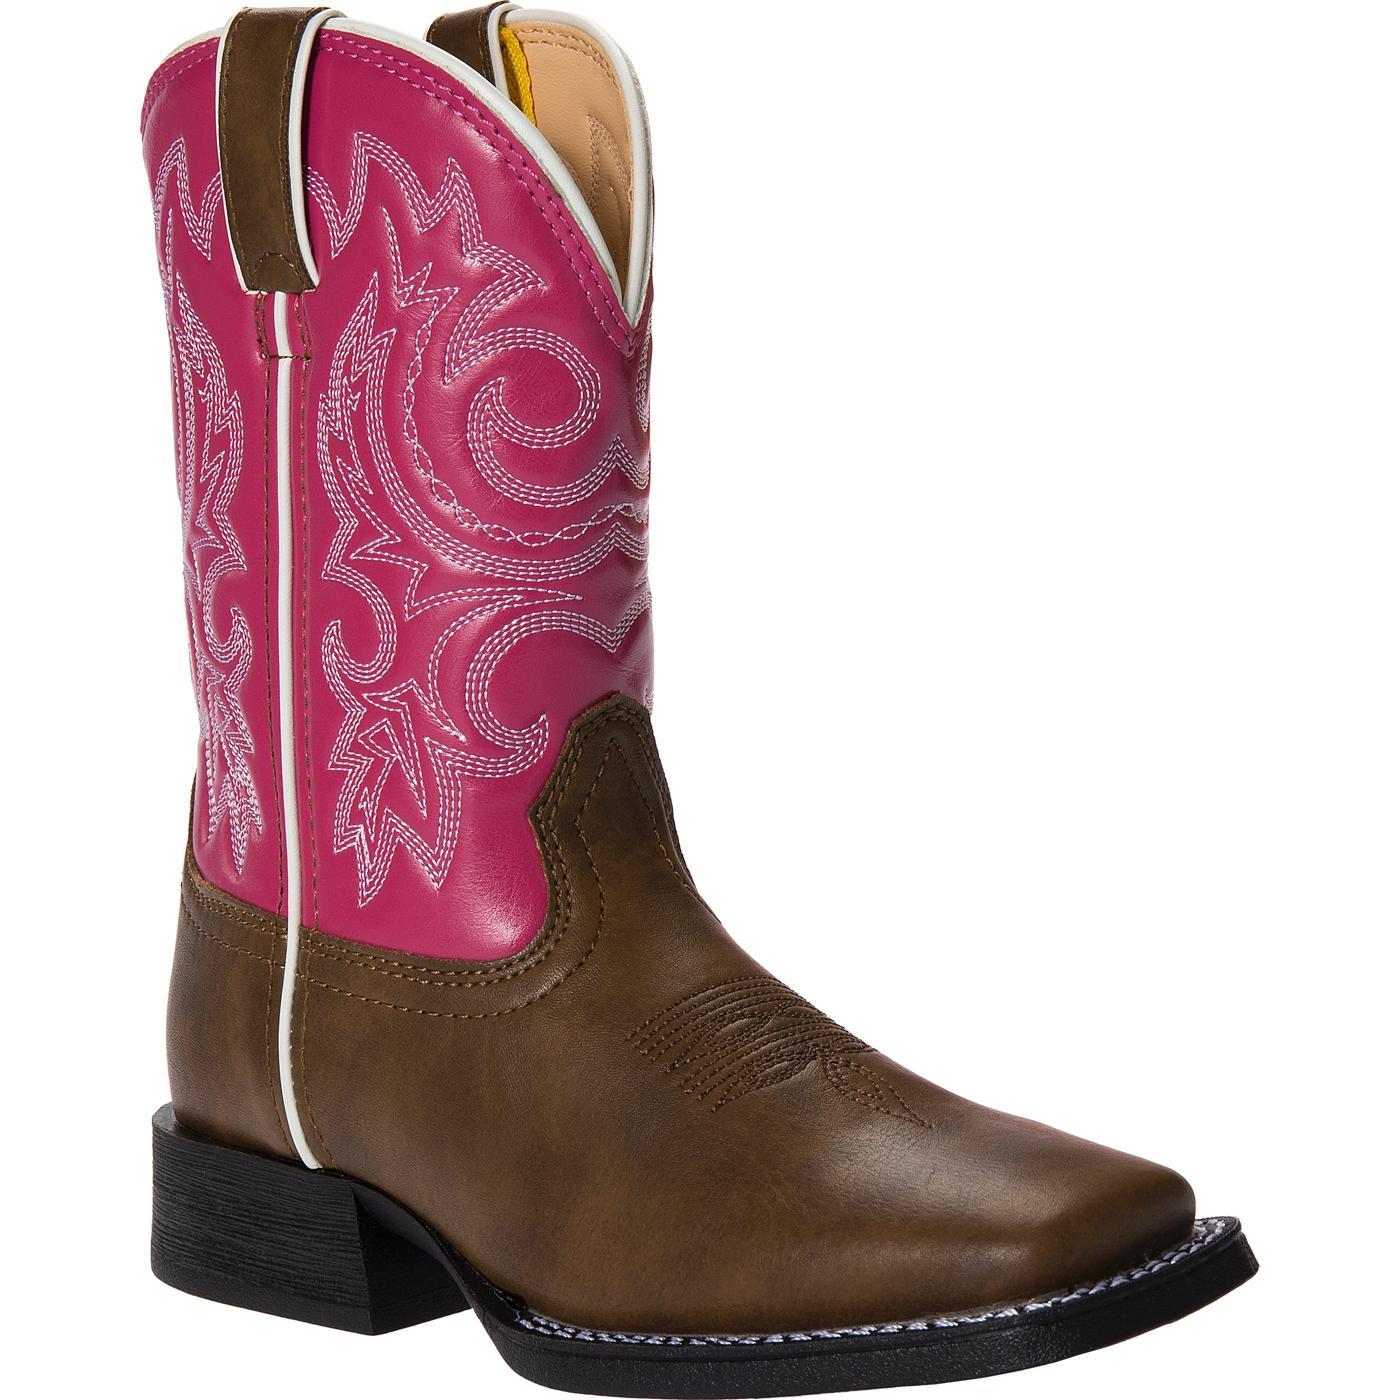 Lil' Durango Little Kid Pink and Brown Western Boot, BT217